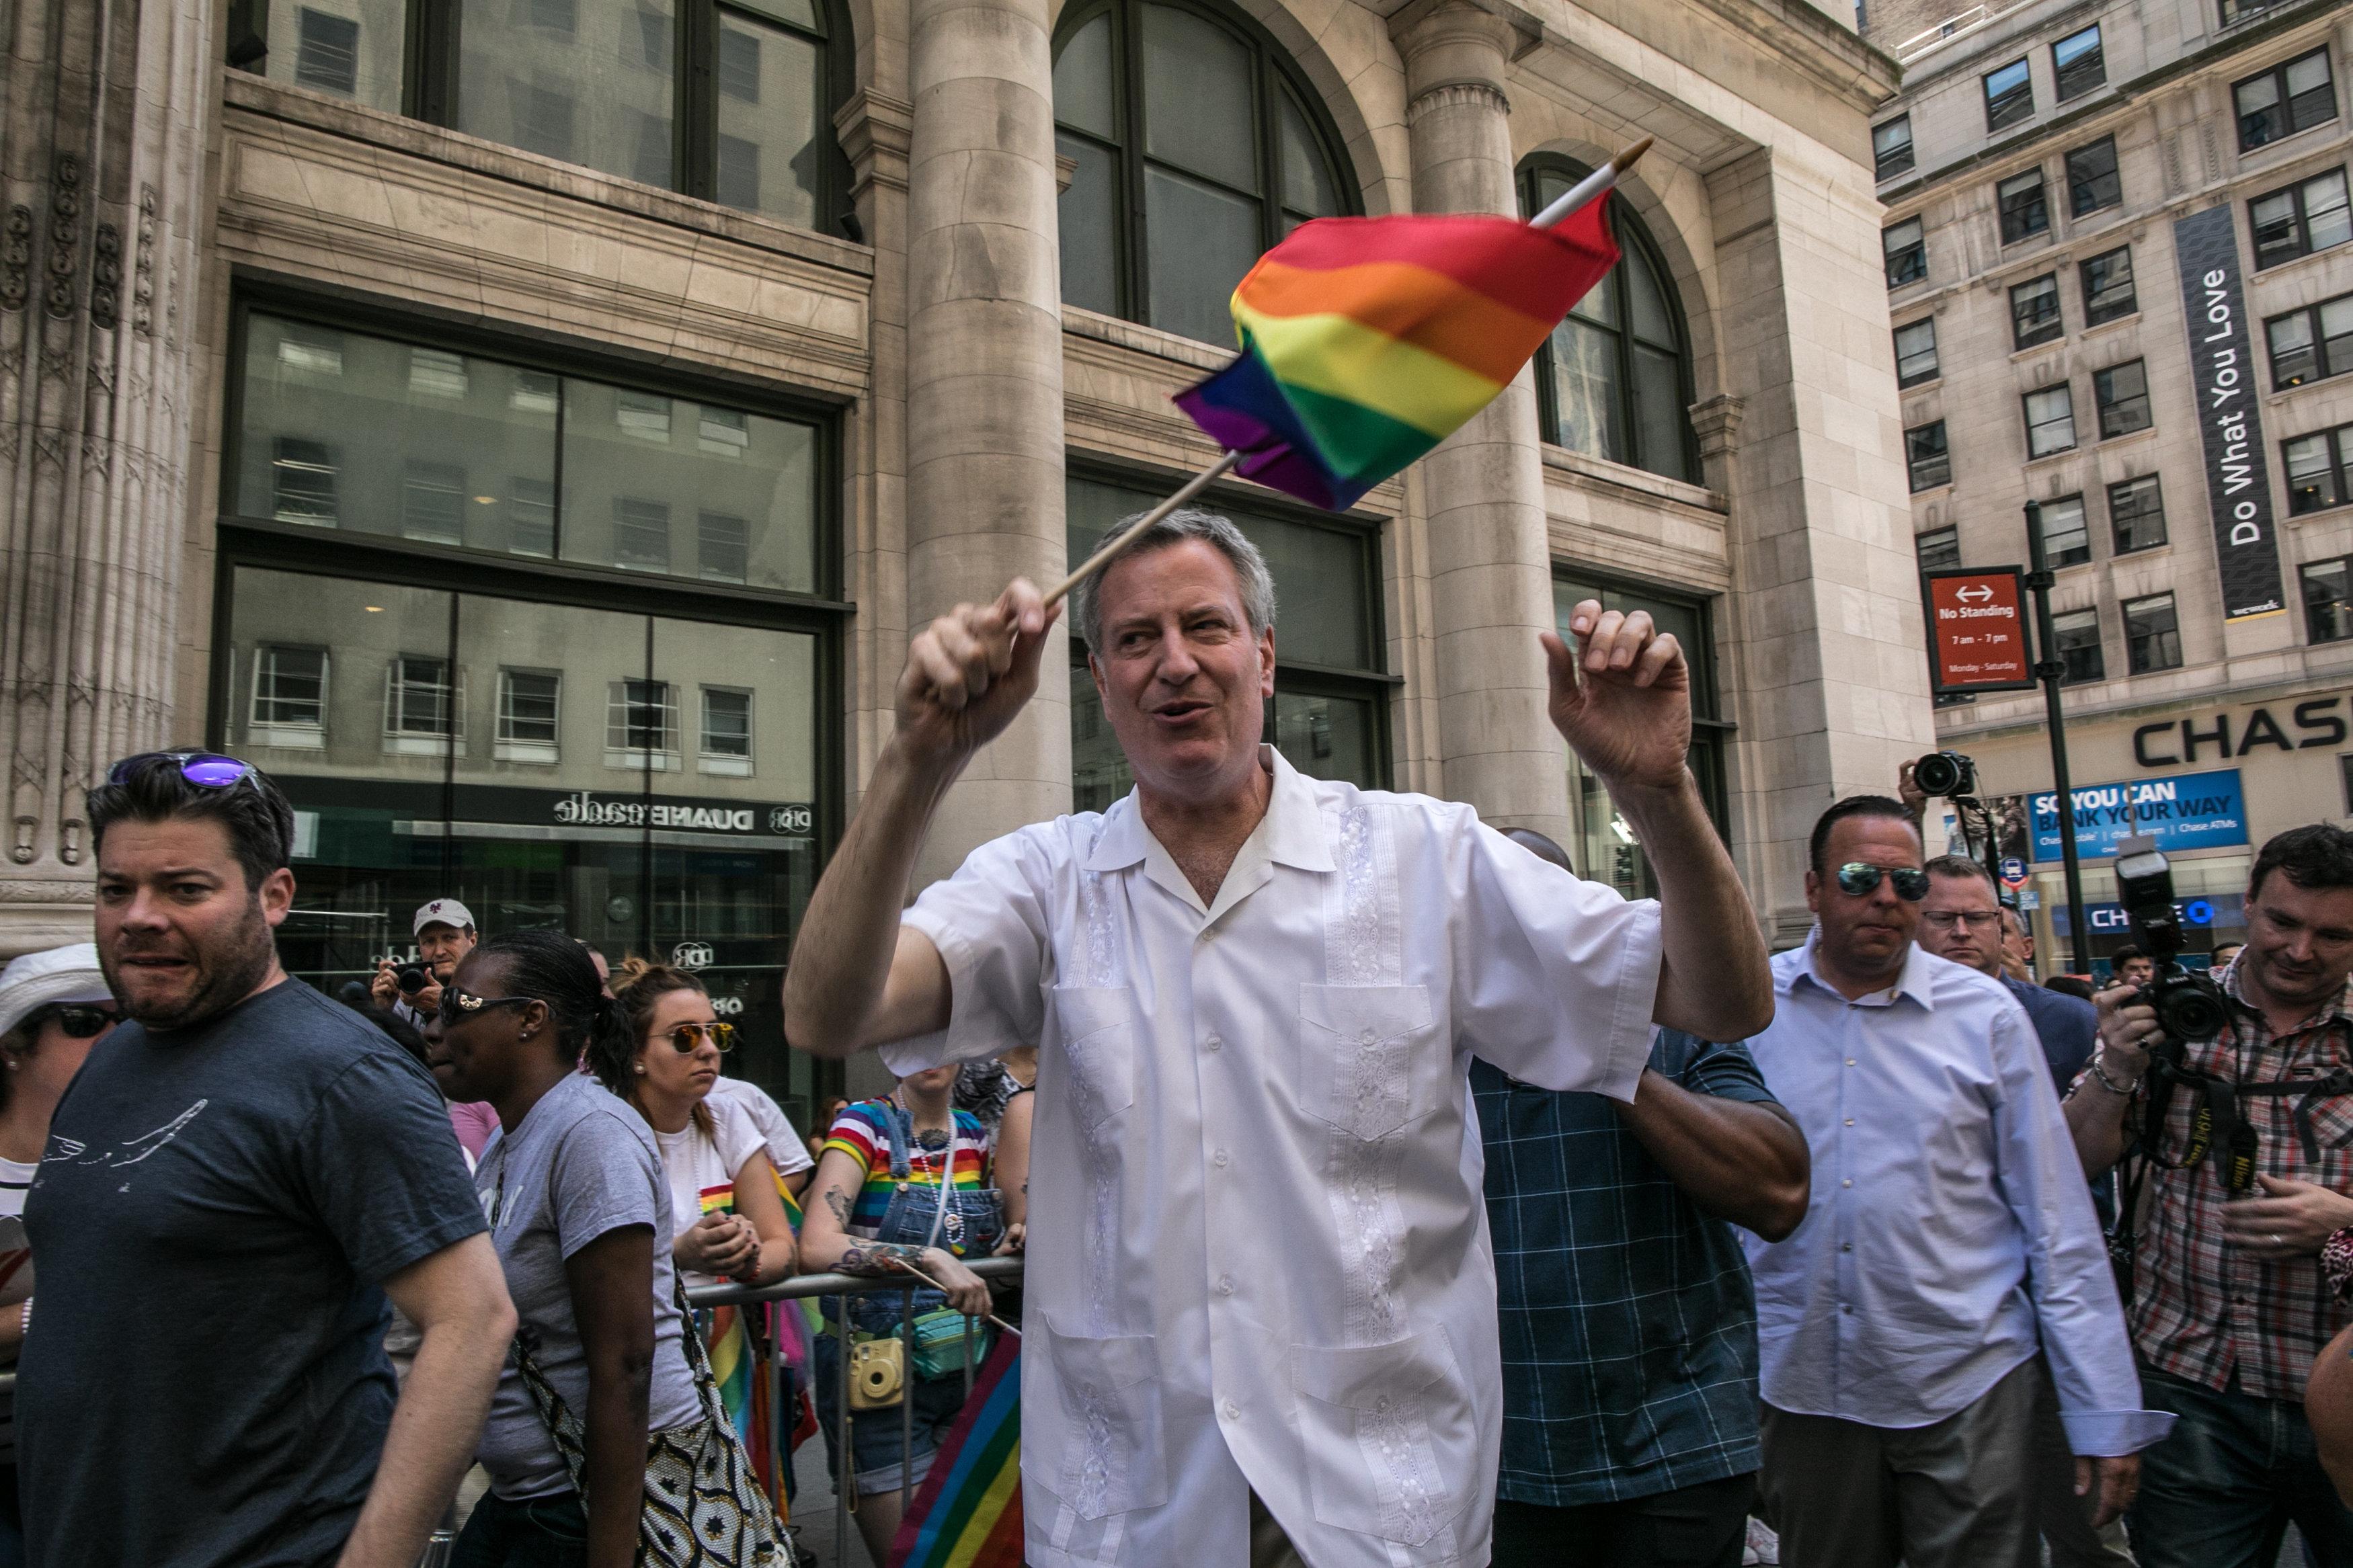 NYC Mayor Bill De Blasio Signs Bill Adding Gender 'X' To Birth